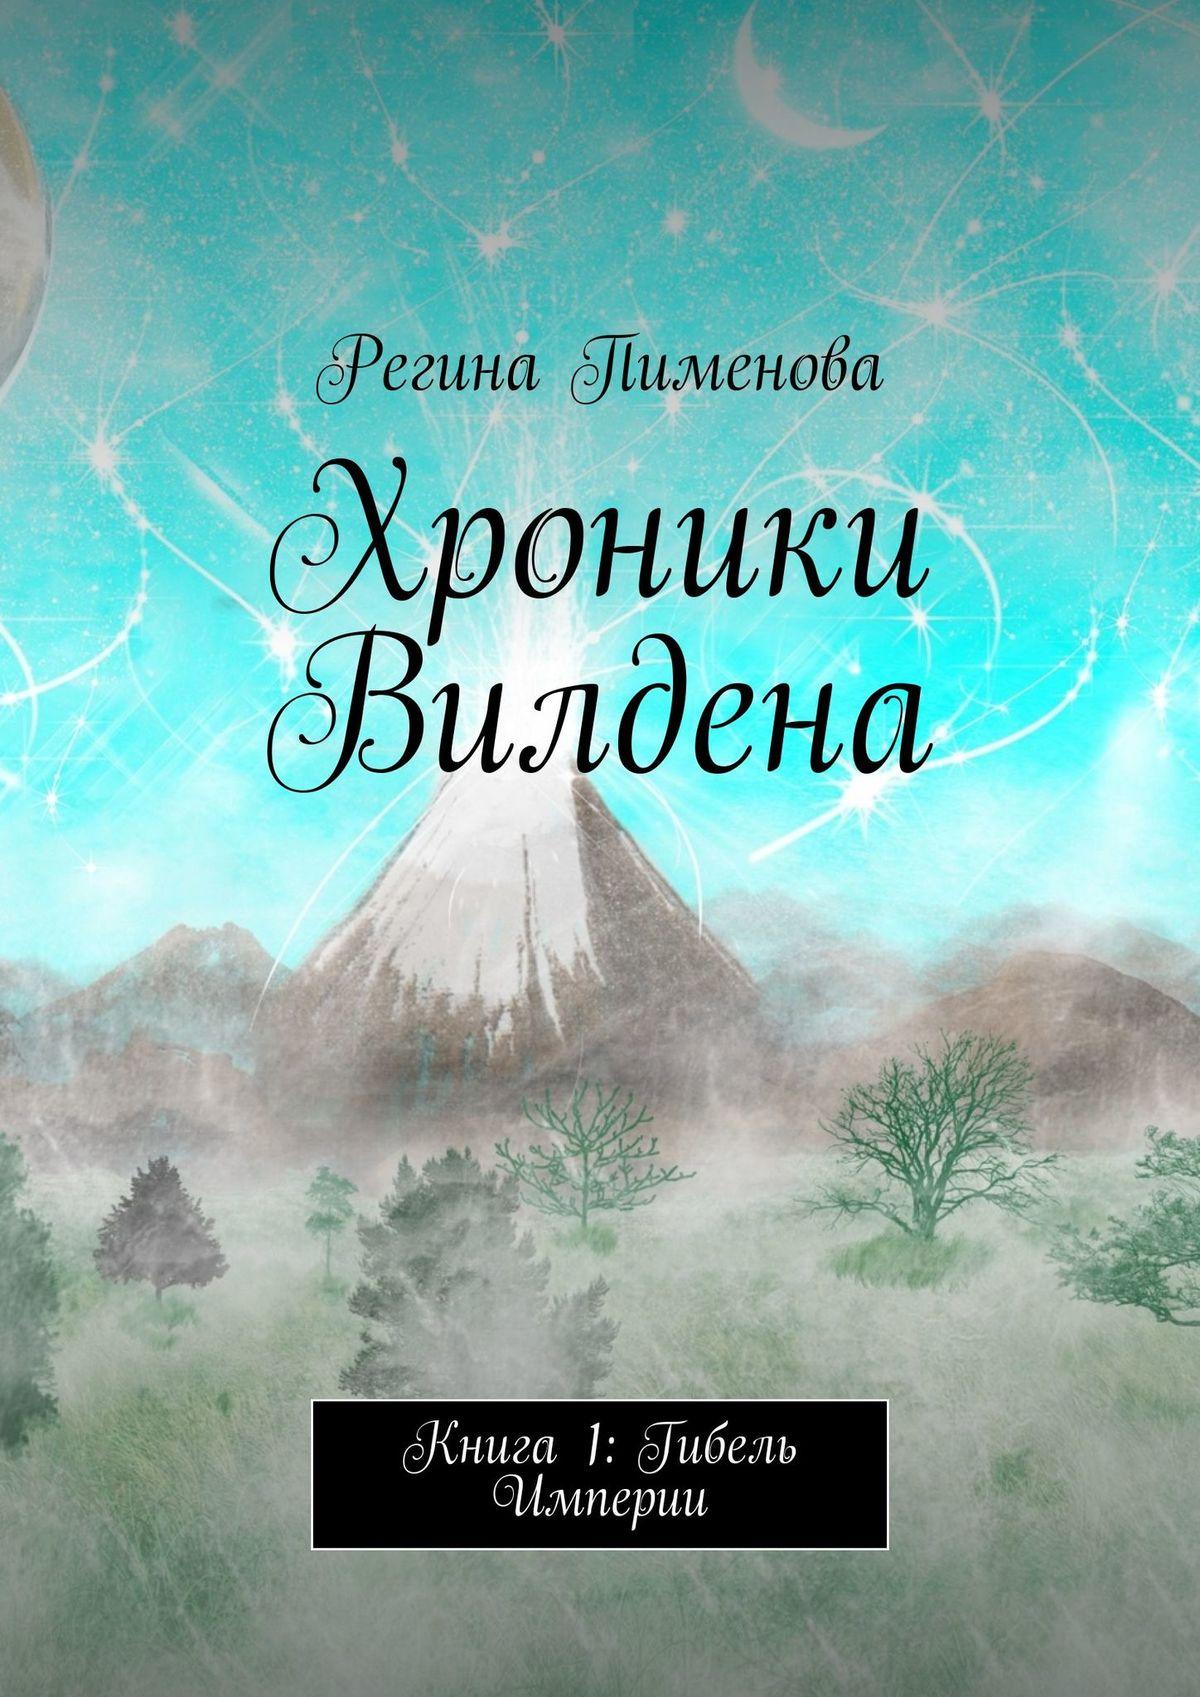 Регина Пименова Хроники Вилдена. Книга 1: Гибель Империи